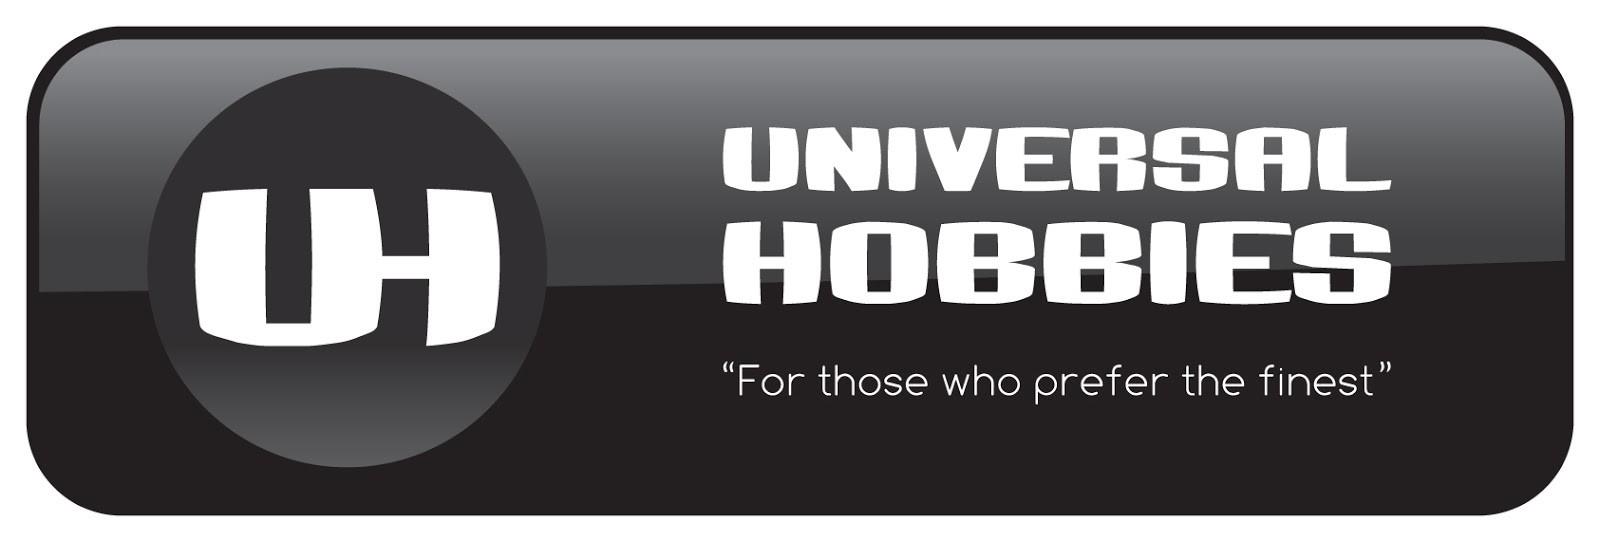 jouets agricoles universal hobbies